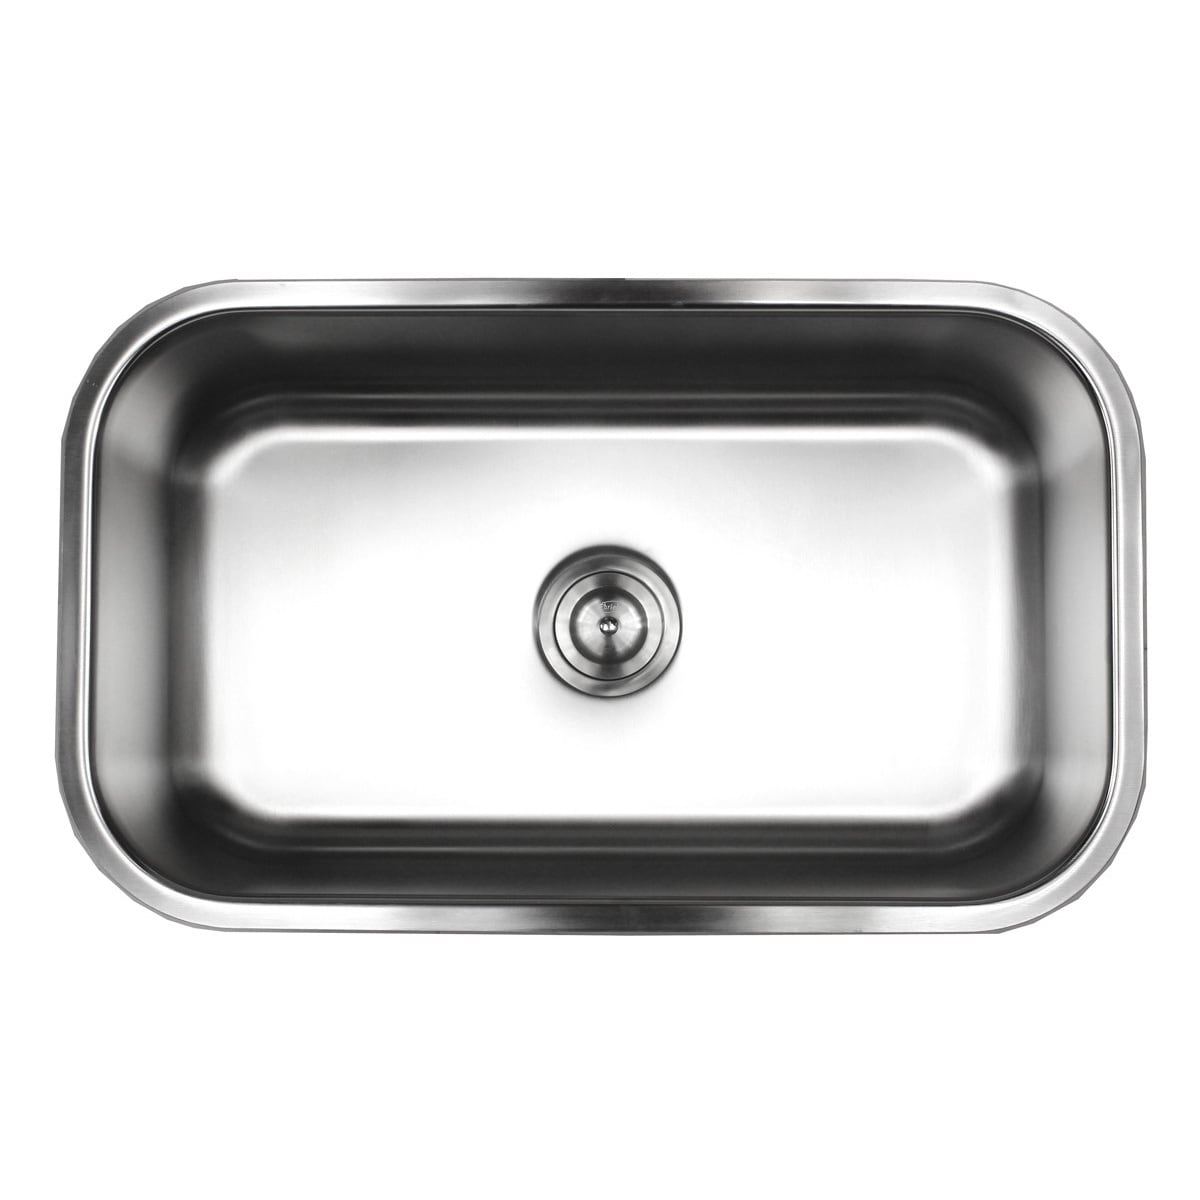 contempo living 18 960 30 inch 18 gauge stainless steel undermount single bowl kitchen sink 10 inch deep